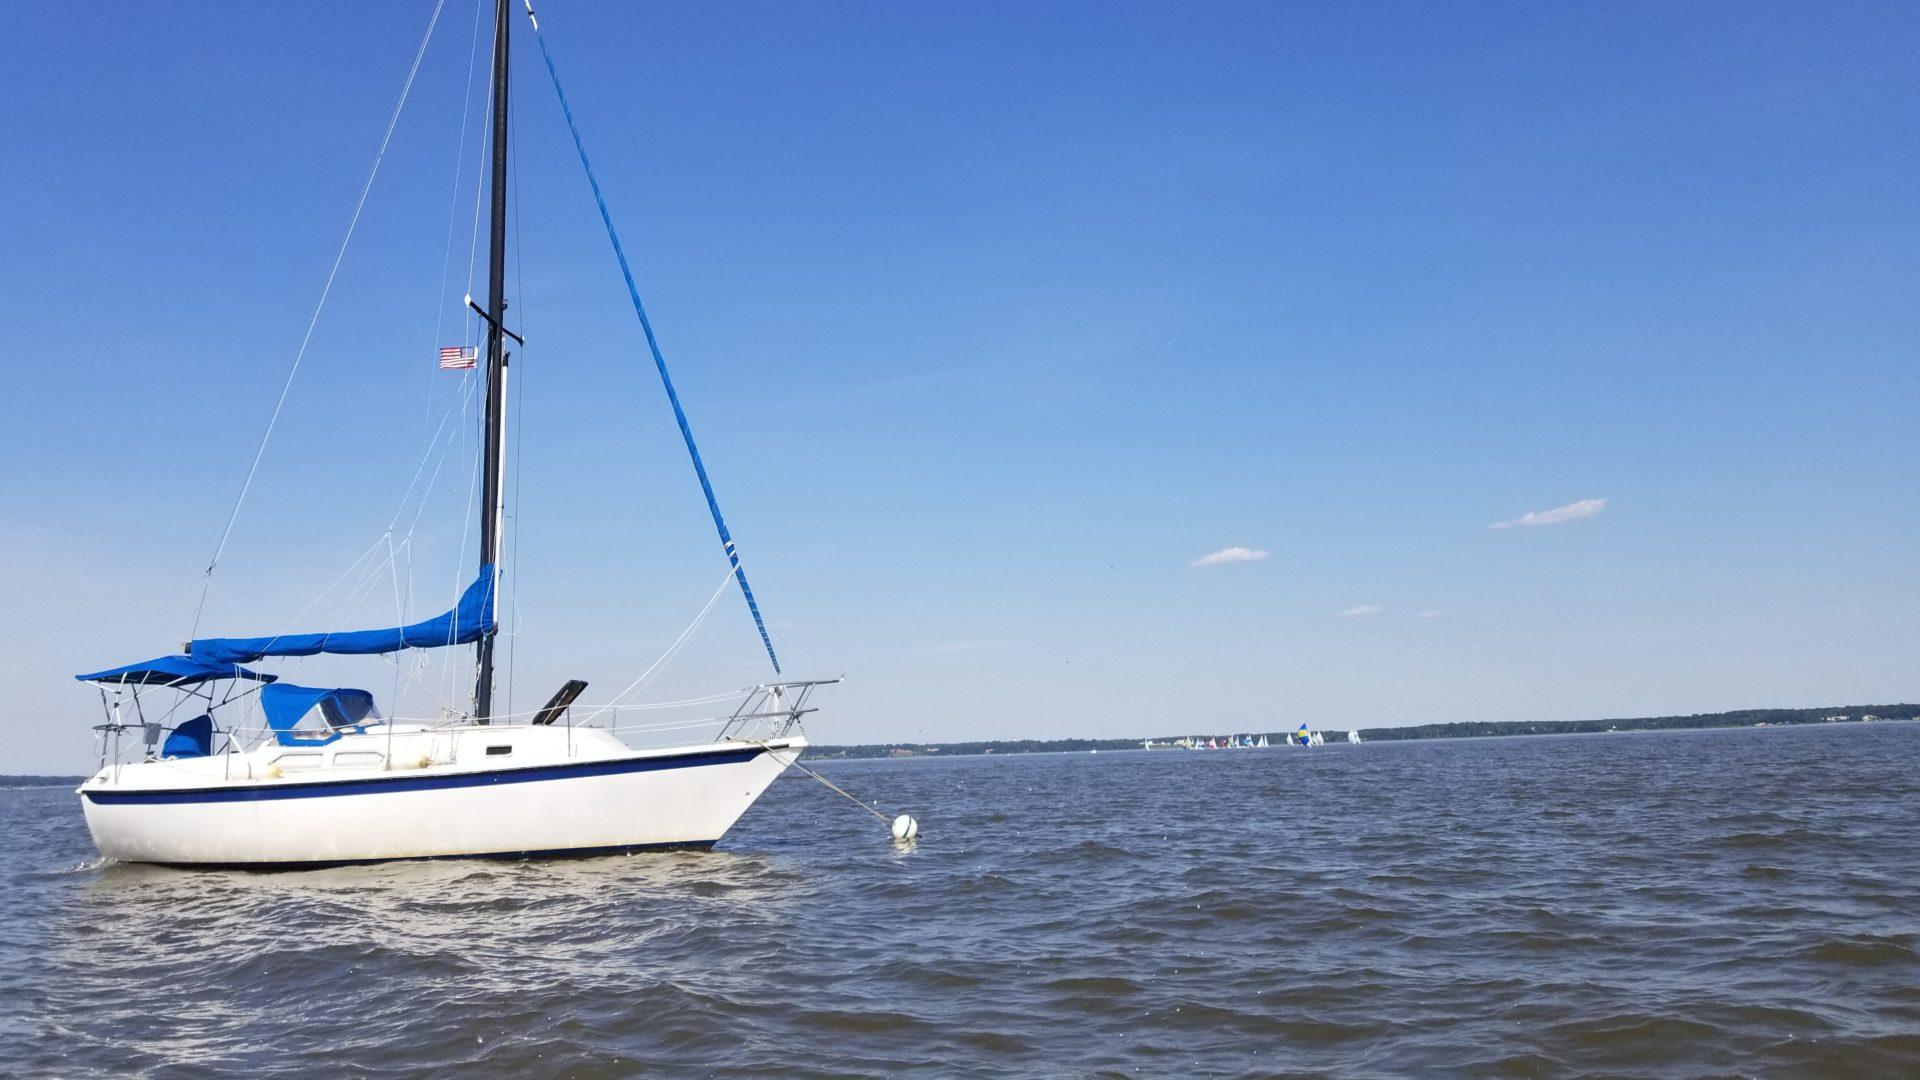 Northern Virginia Sailing School